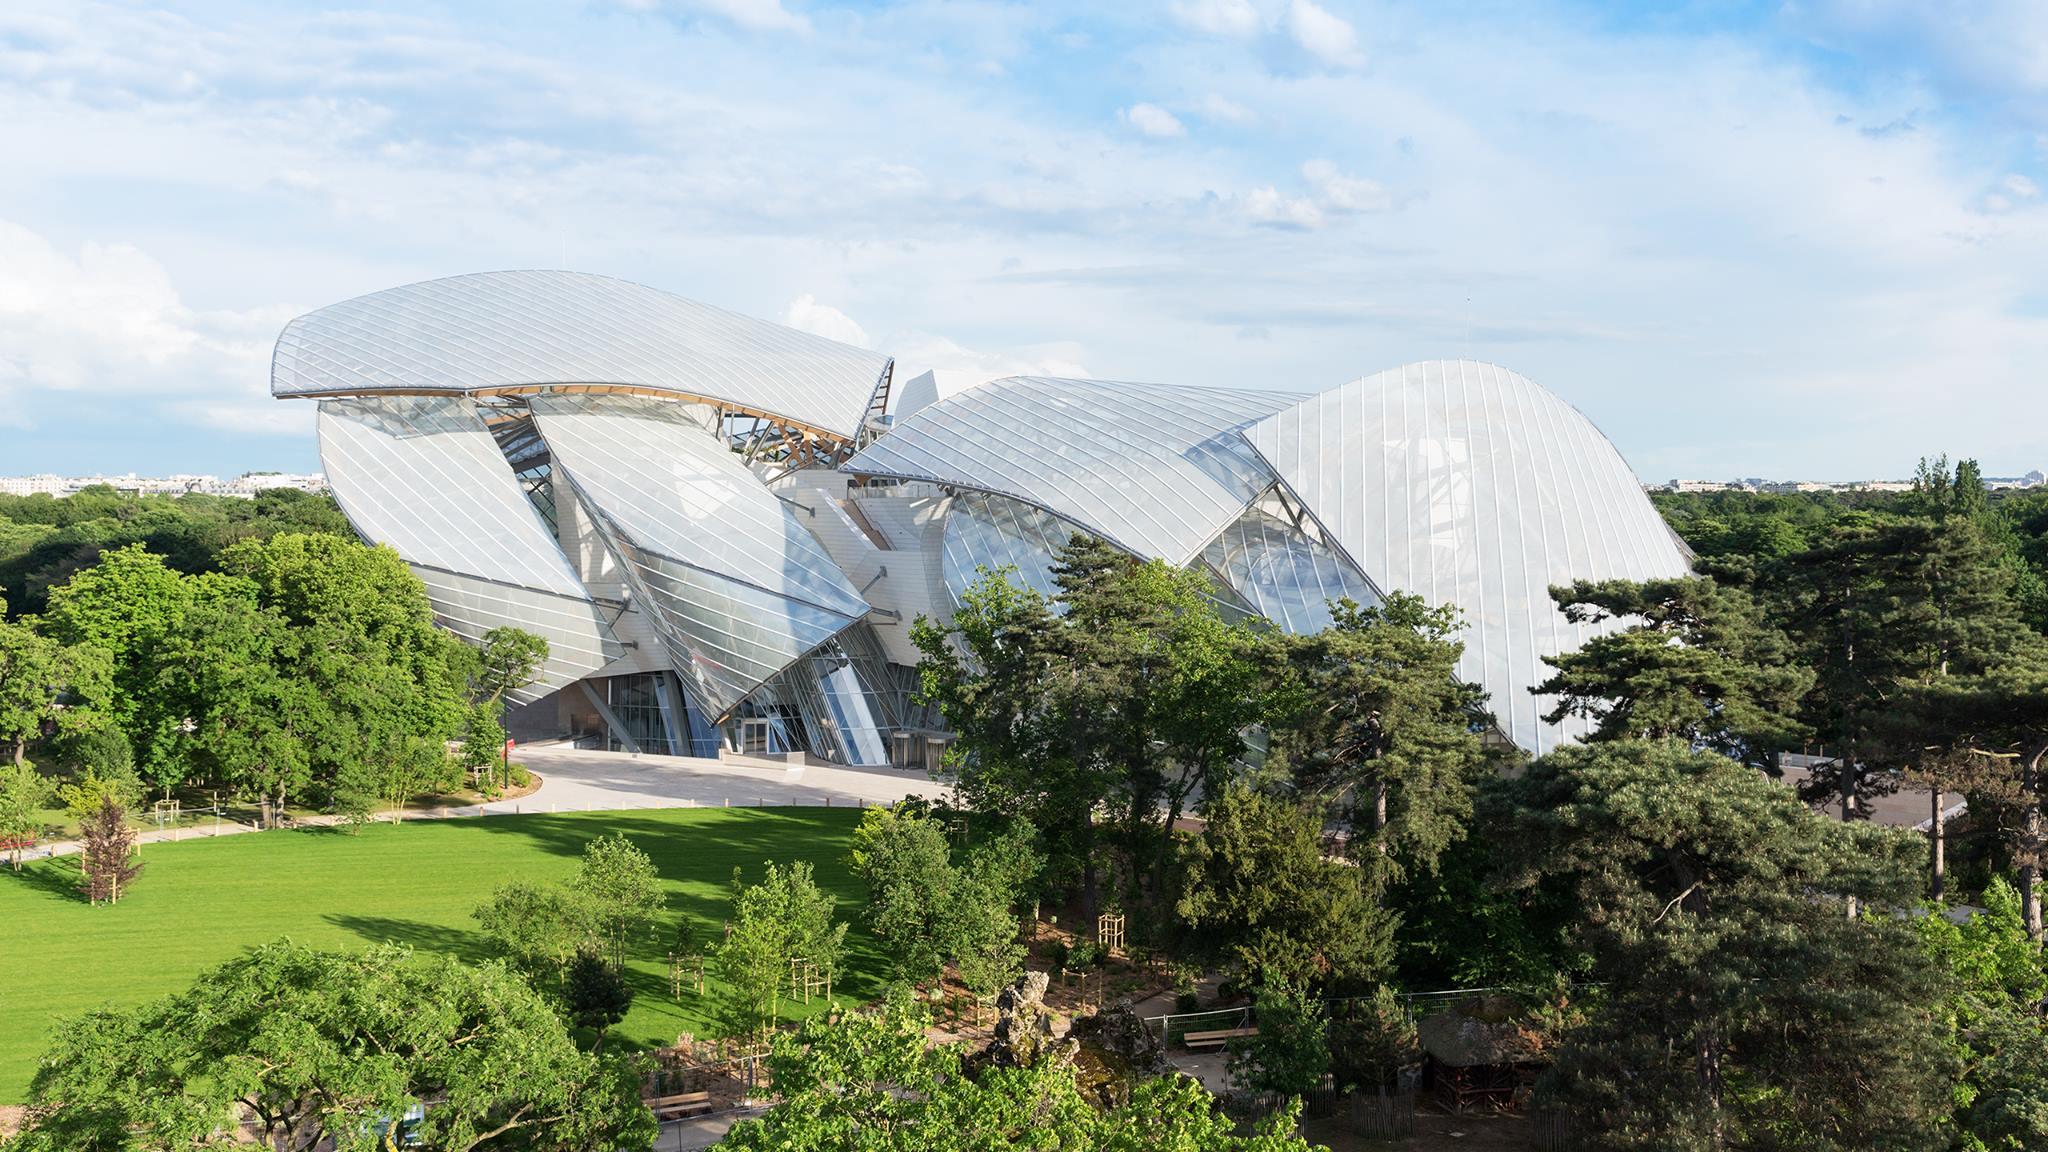 The Fondation Louis Vuitton - a model of emblematic architecture